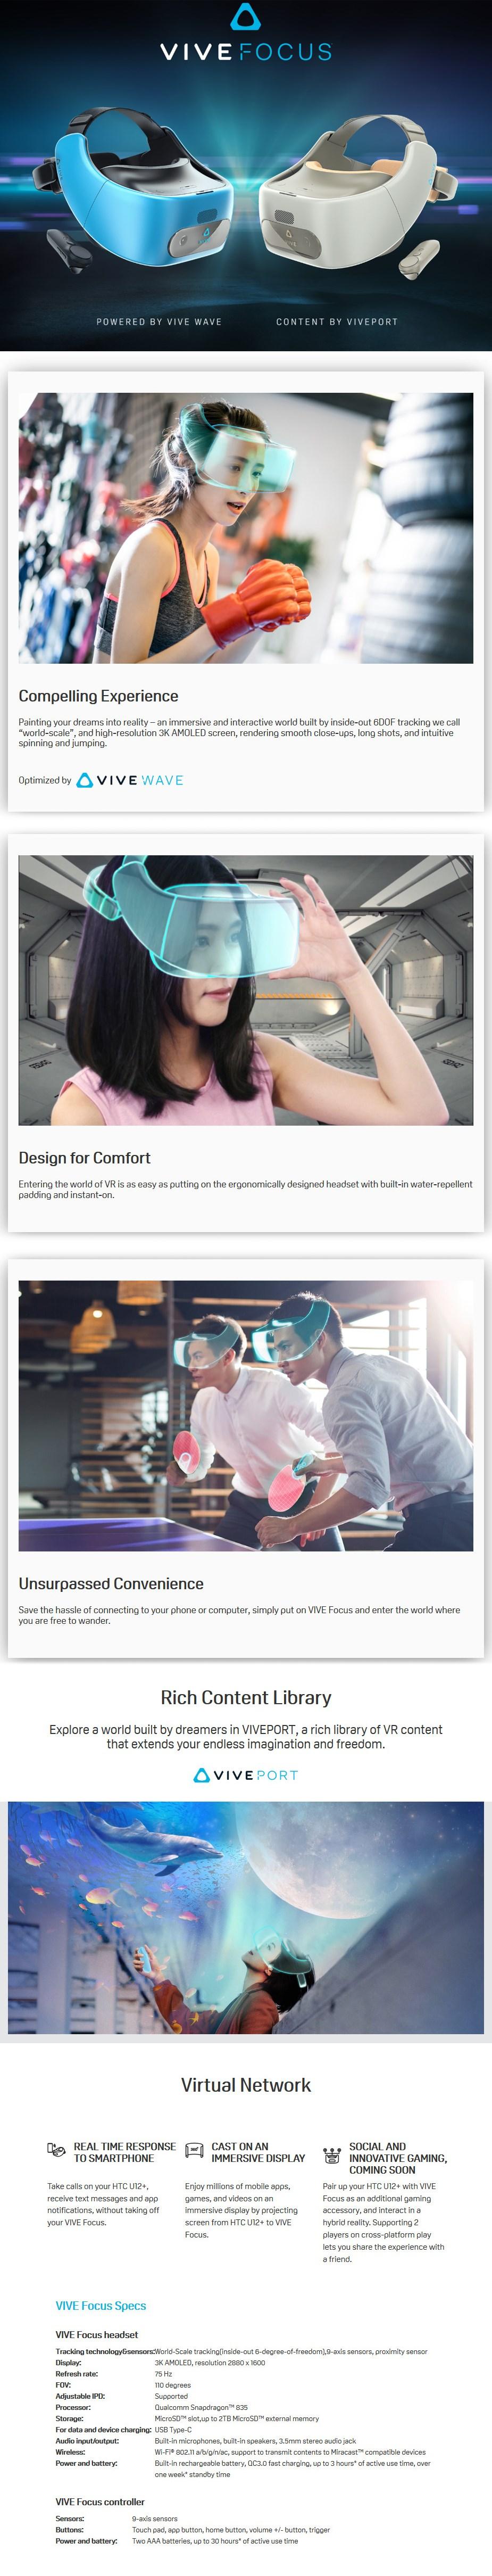 HTC Vive Focus 3K AMOLED Virtual Reality Headset - White - Desktop Overview 1